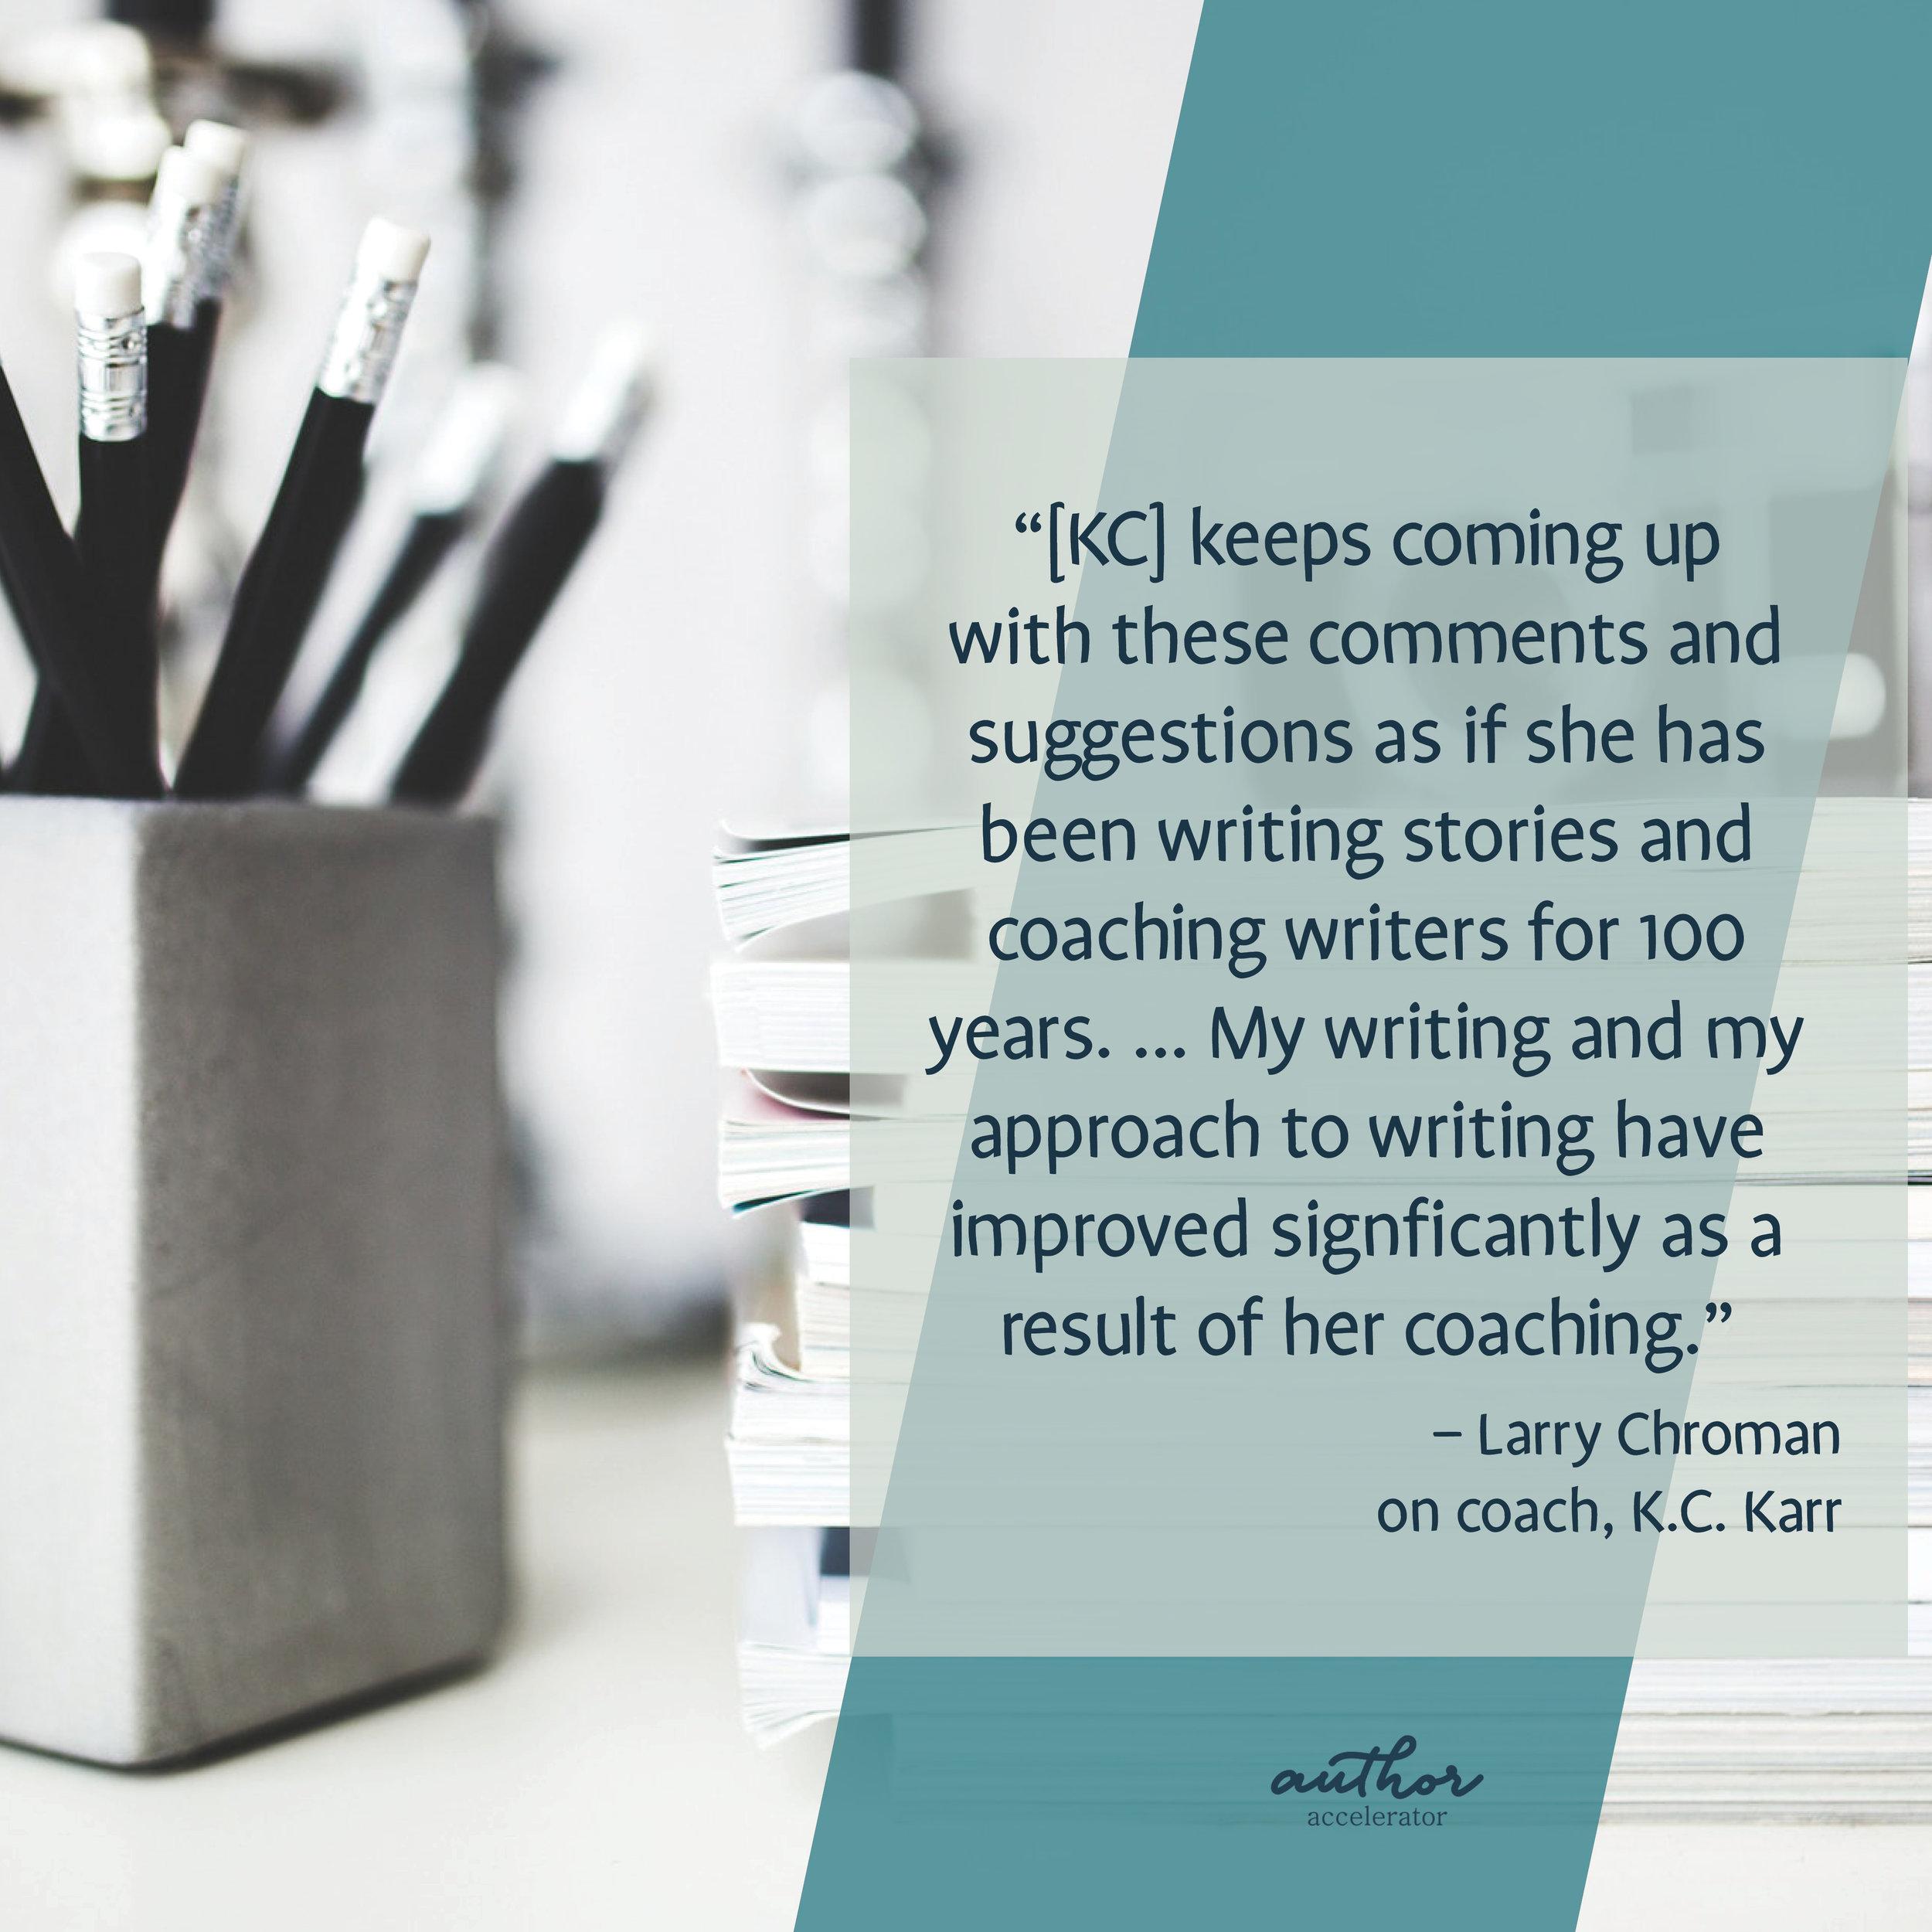 coach_kc_karr_larry_chroman_v2.jpg